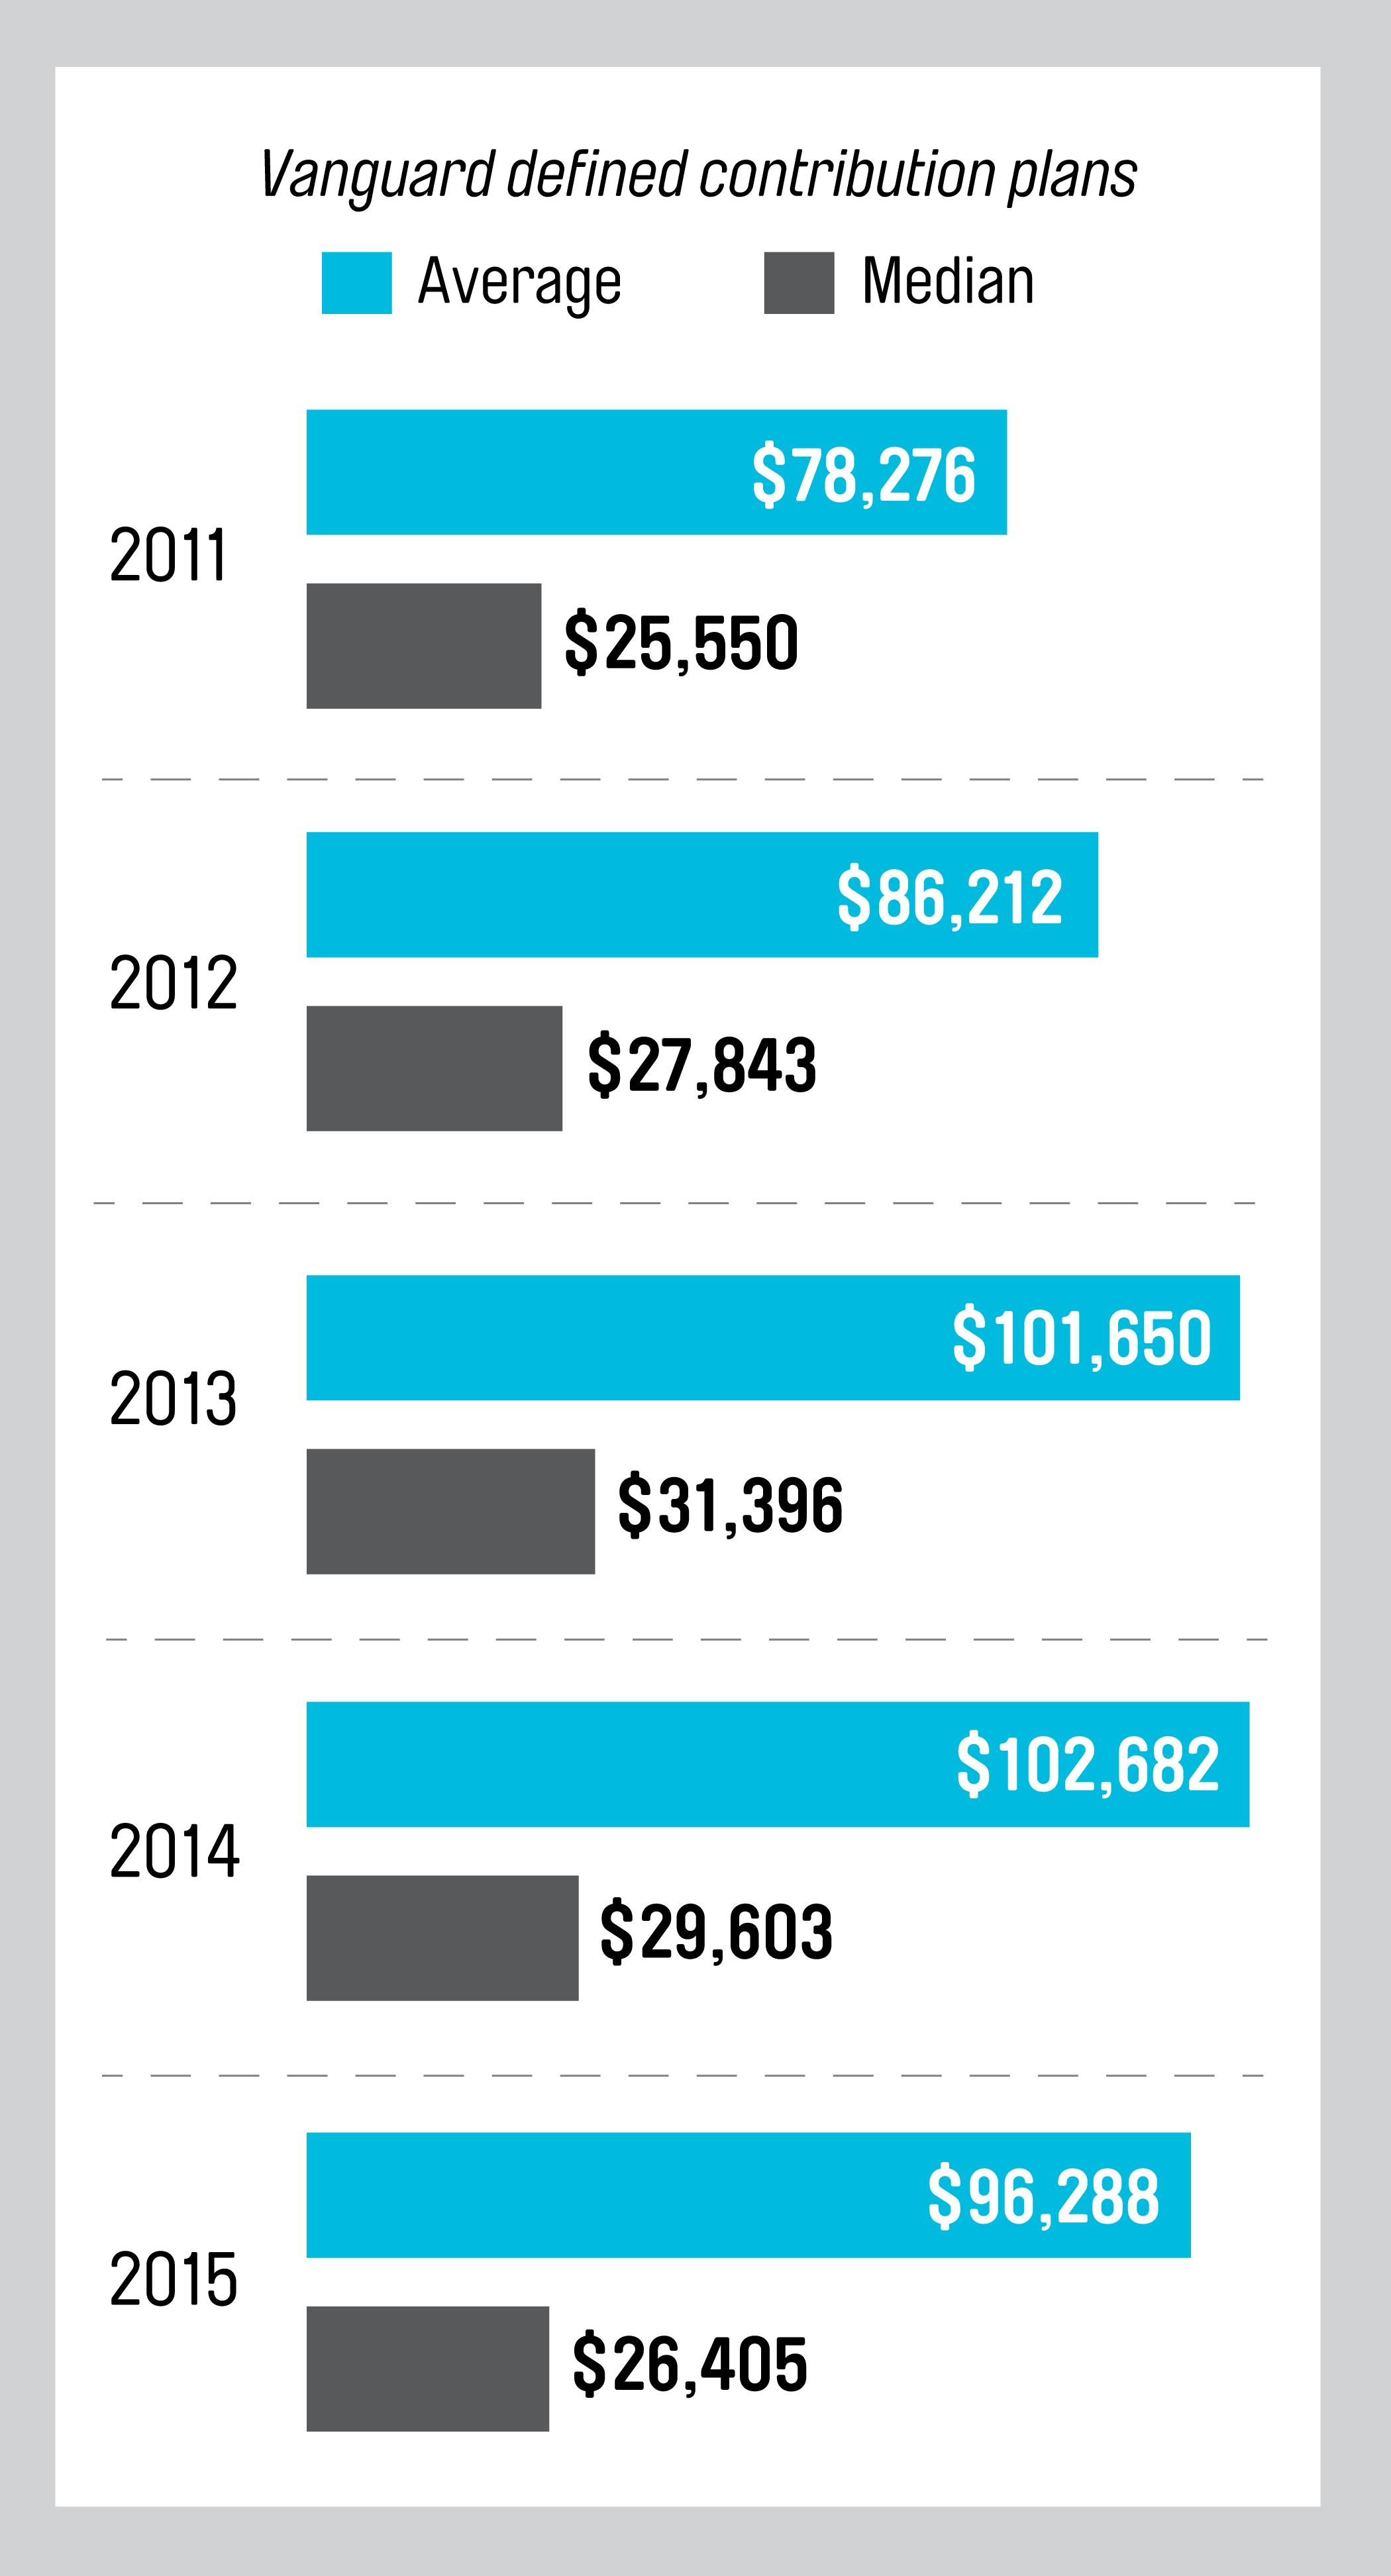 Source: Vanguard, How America Saves 2016.